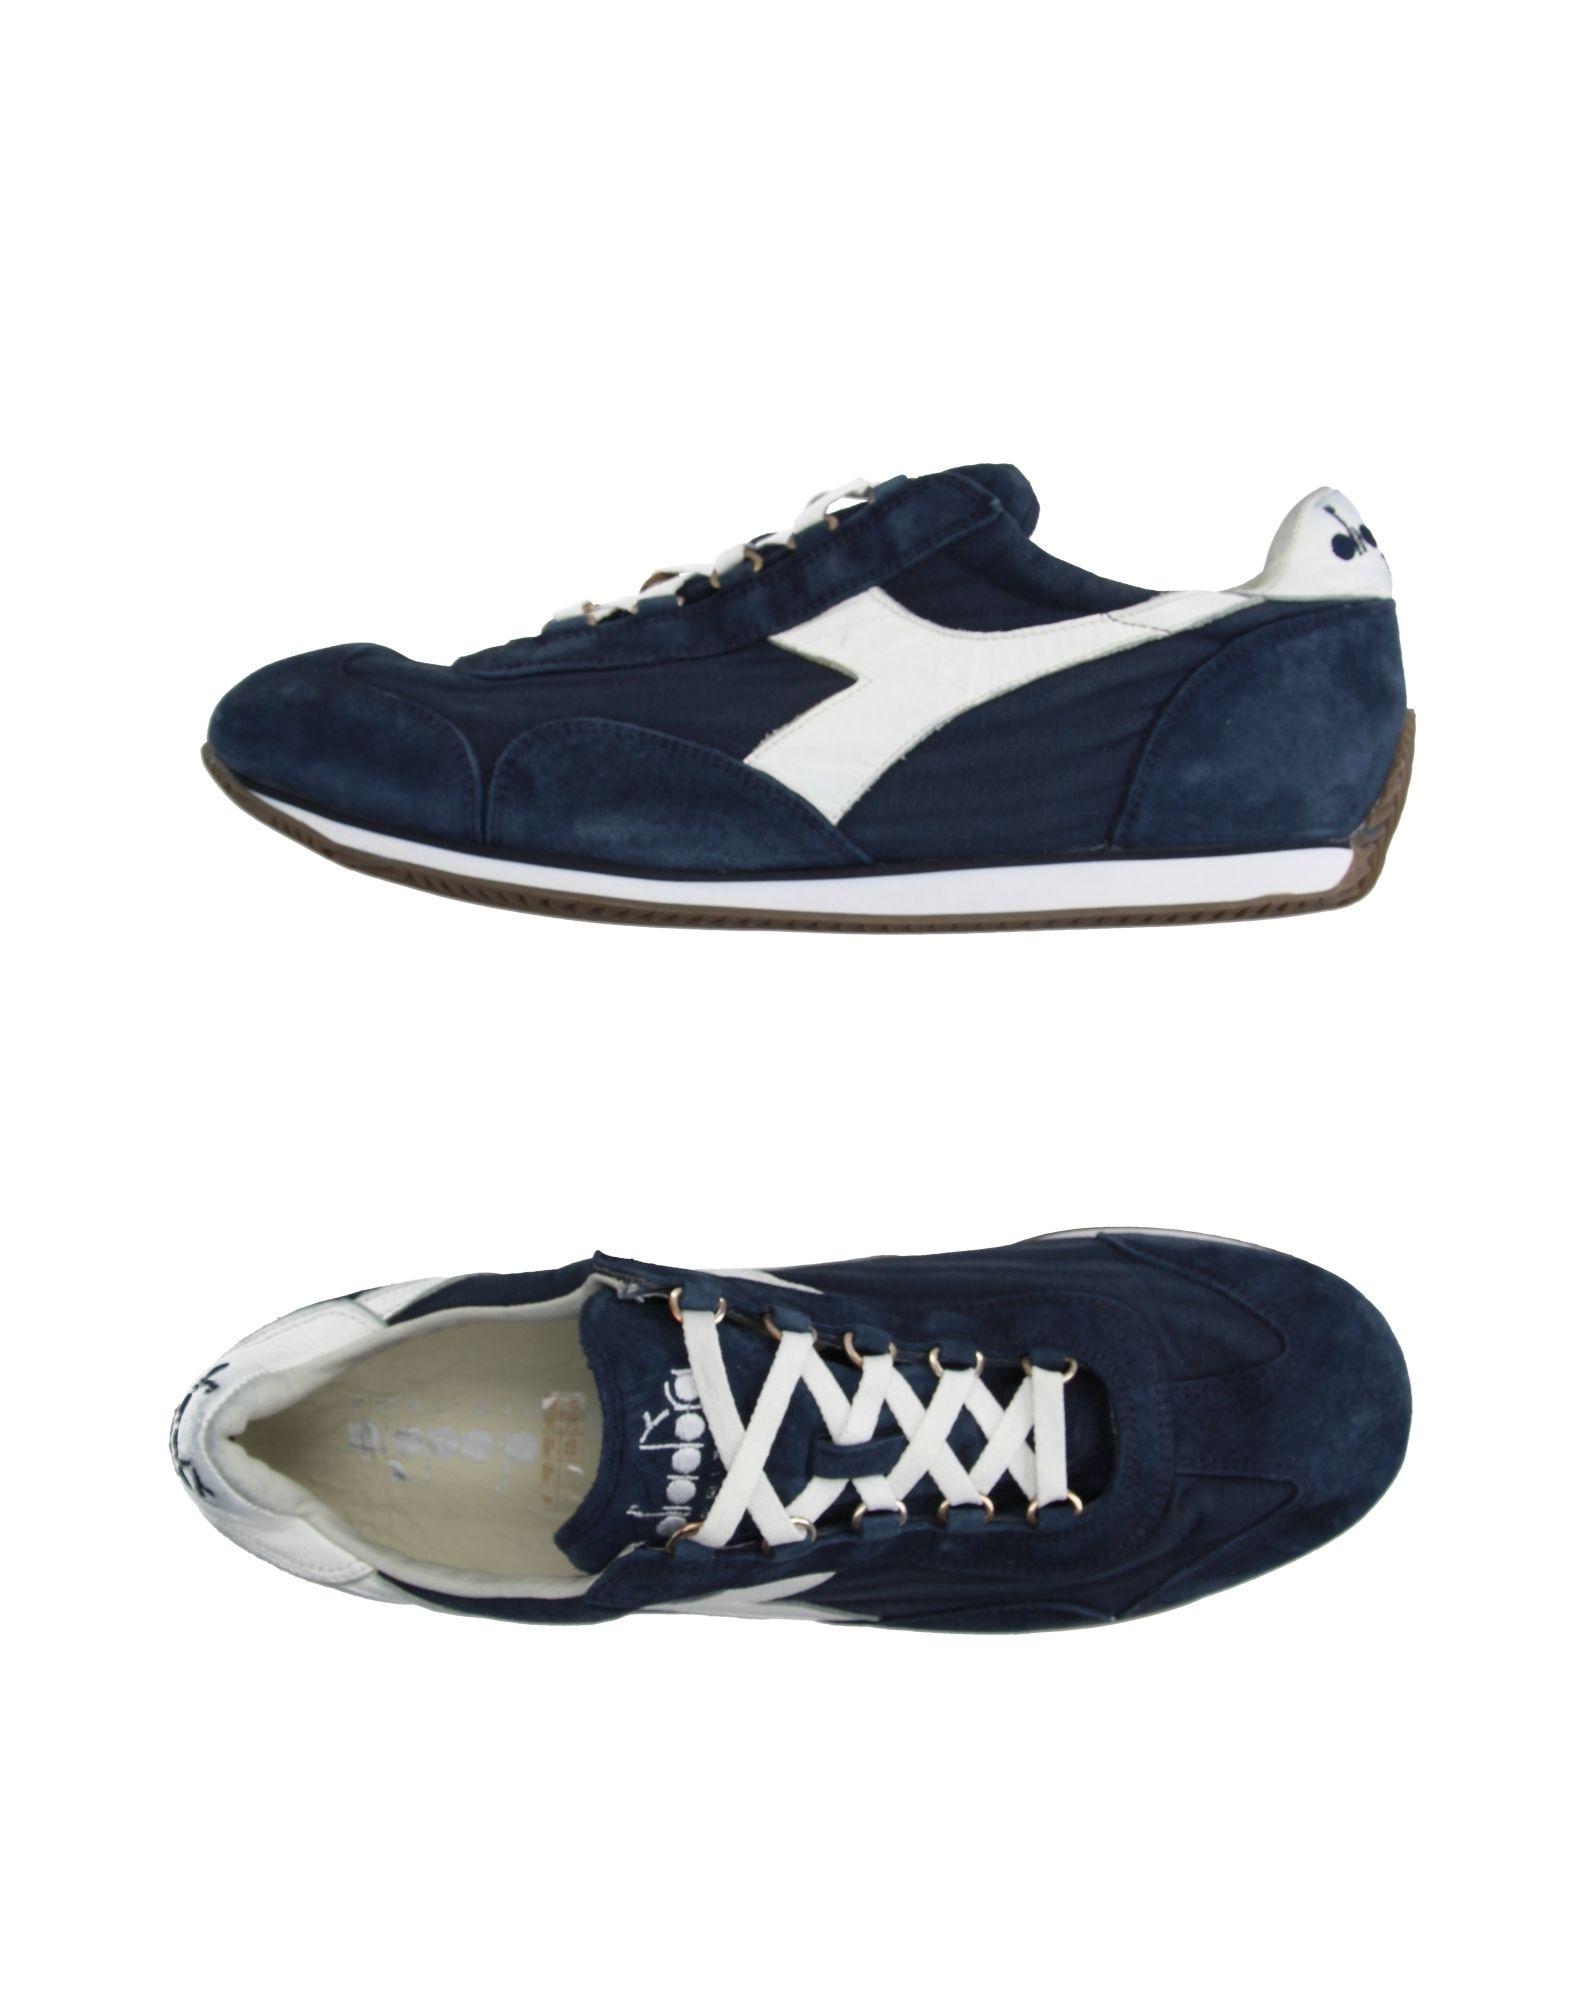 Diadora on Heritage Sneakers - Men Diadora Heritage Sneakers online on Diadora  Canada - 11150860FM 8d69ff